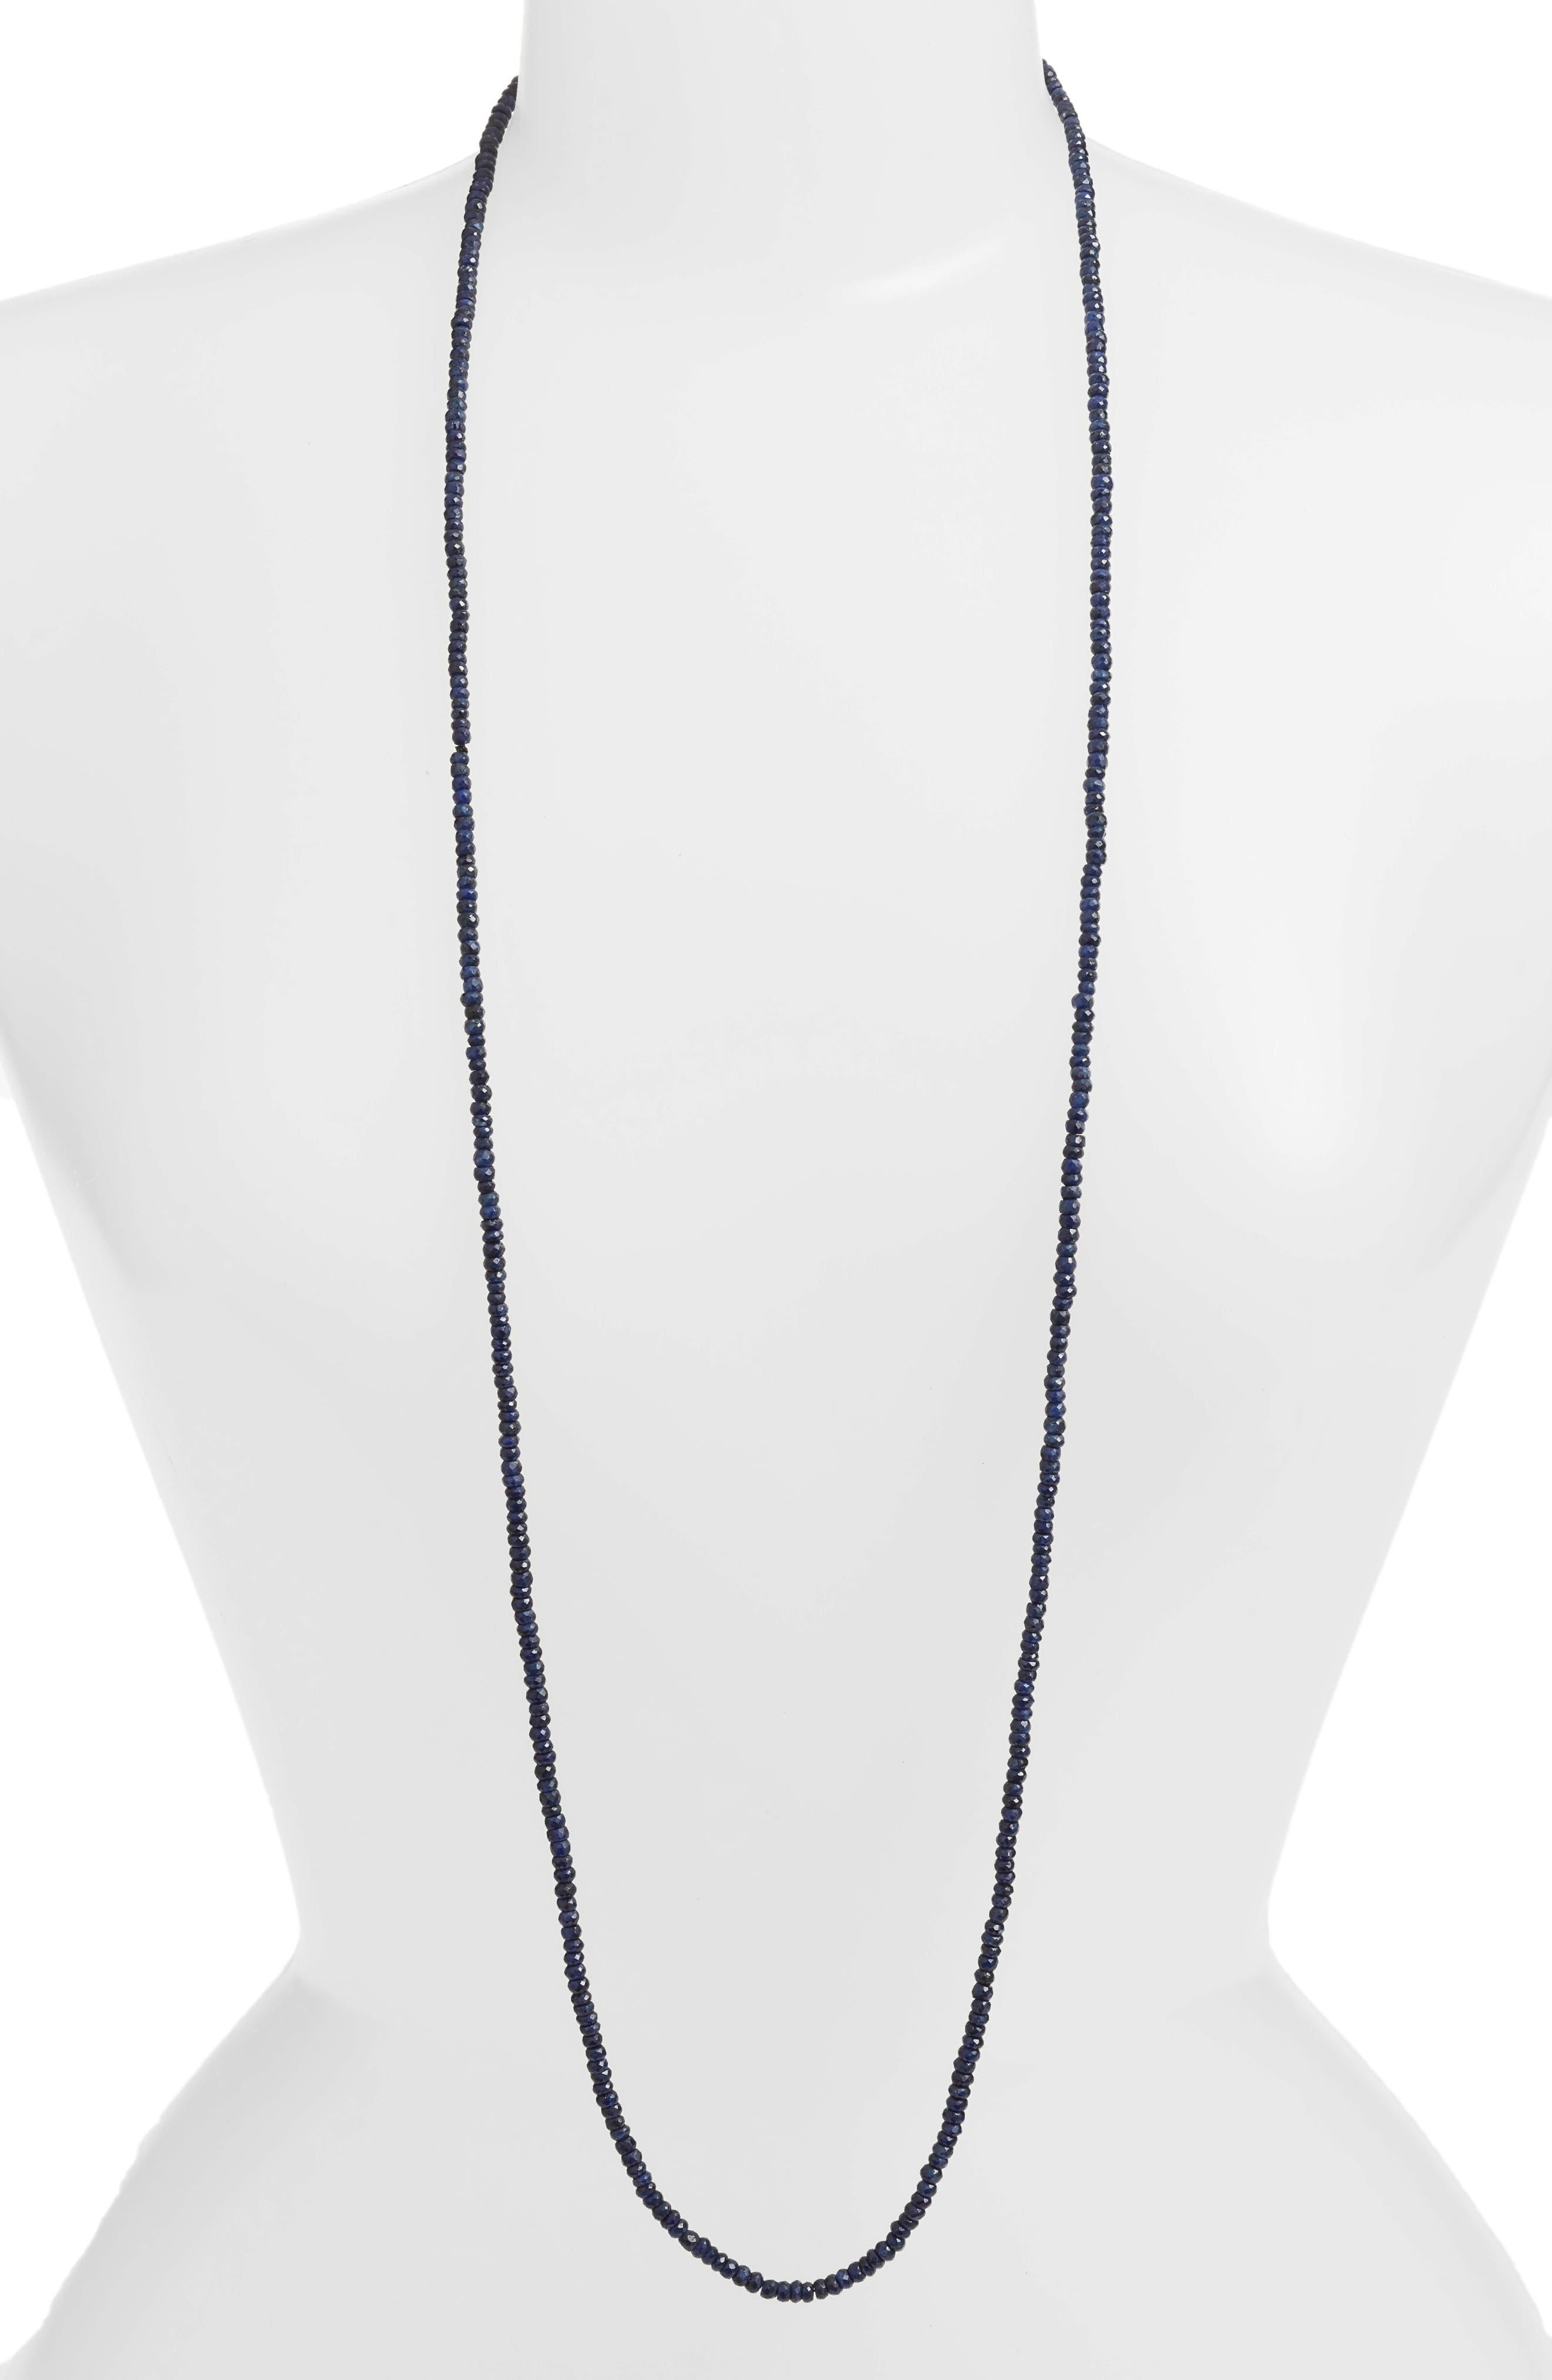 Topanga Gemstone Necklace,                             Main thumbnail 1, color,                             Sapphire